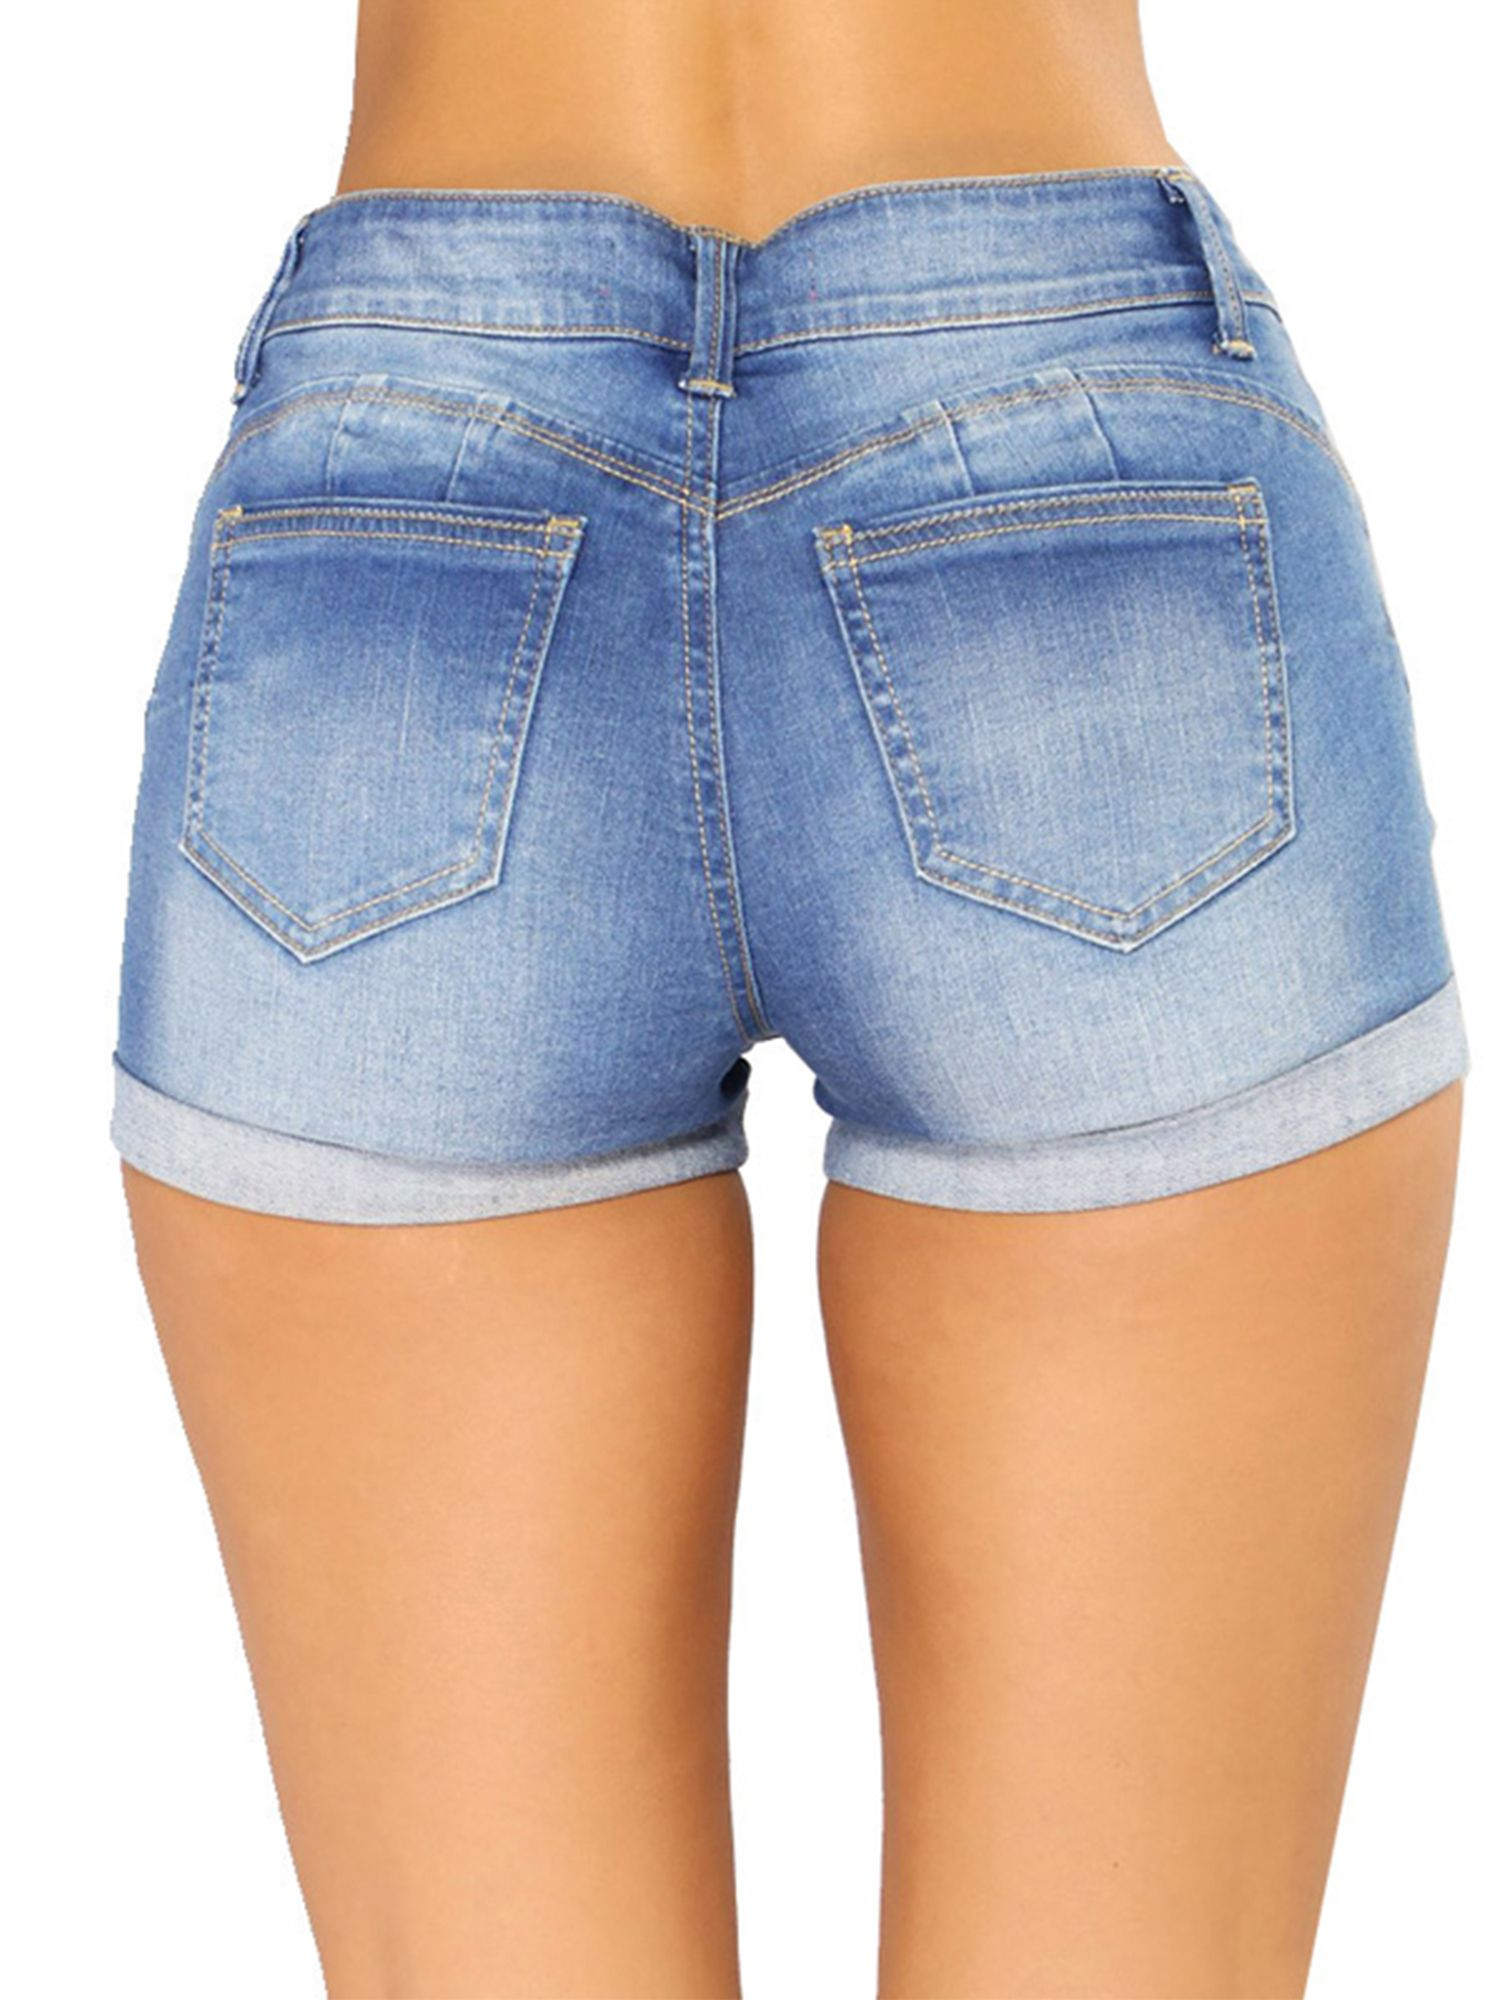 Domple Womens Summer Skull Print Split Ripped Low Rise Denim Shorts Jeans Hot Pants